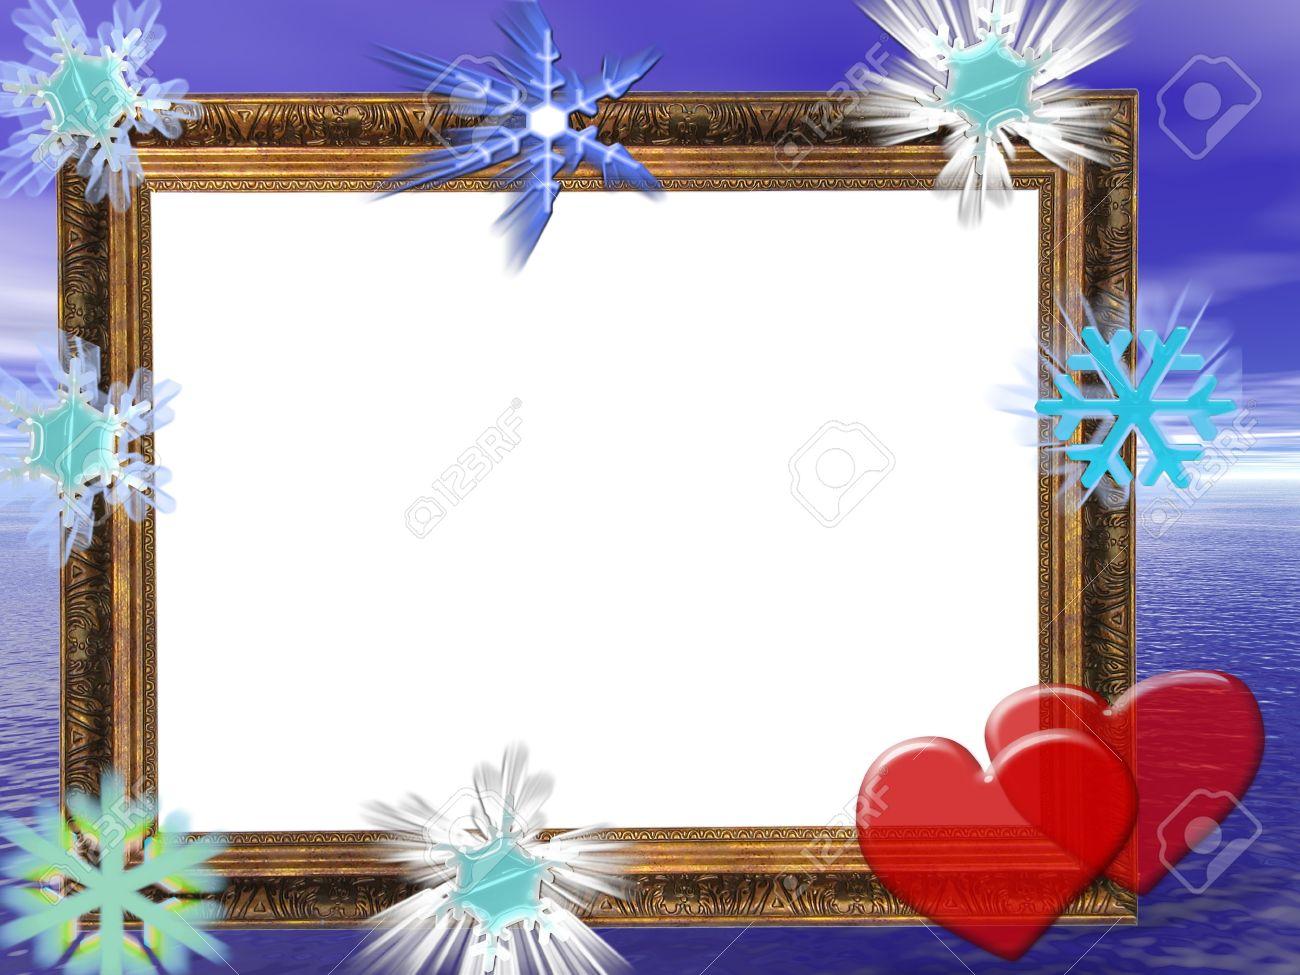 Wedding Anniversary Photo Frame - Page 2 - Frame Design & Reviews ✓